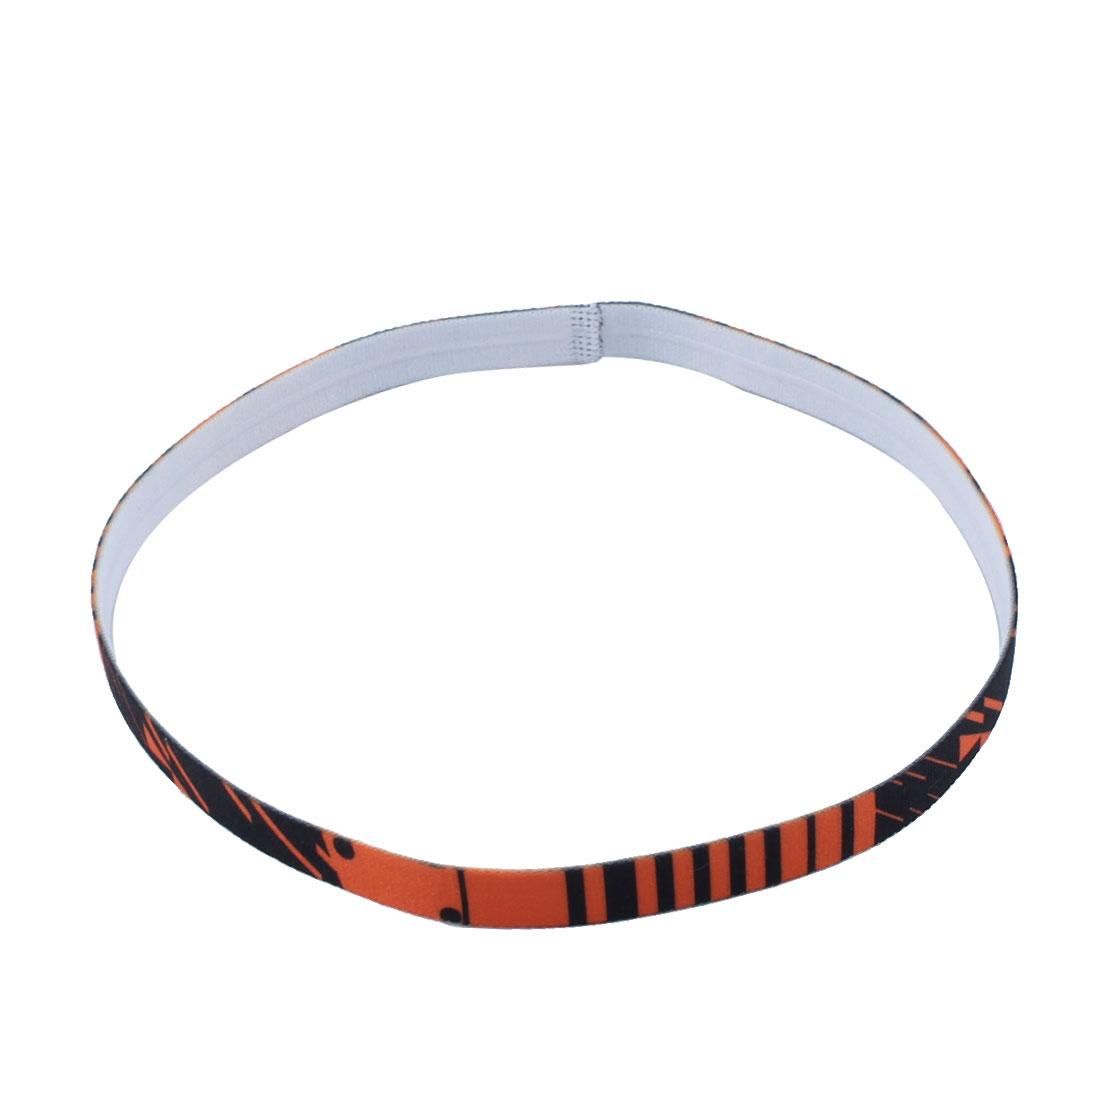 Exercise Silicone Flower Printed Non-slip Strech Sports Headband Orange Black